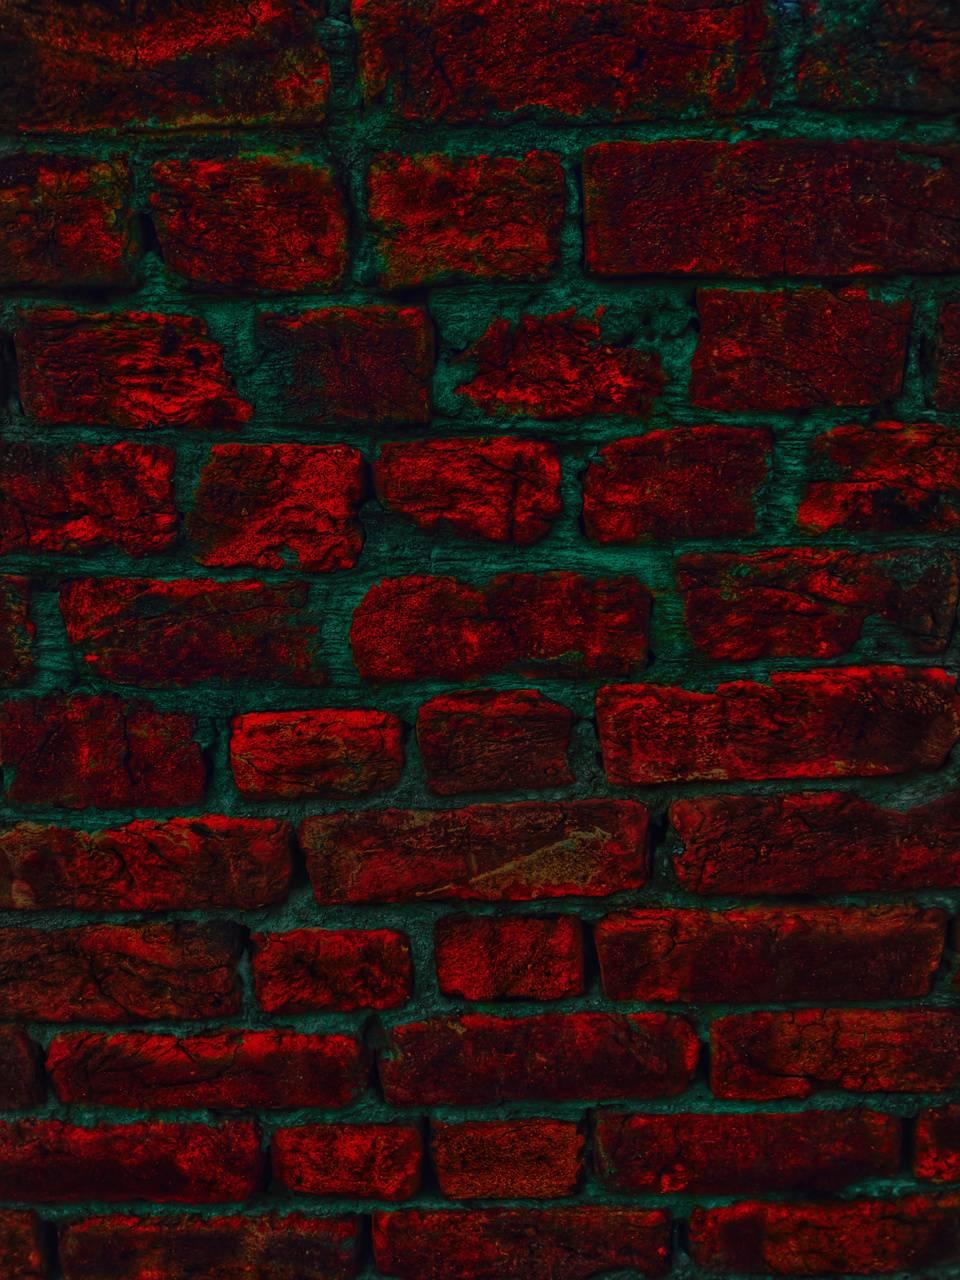 Bricks Photography